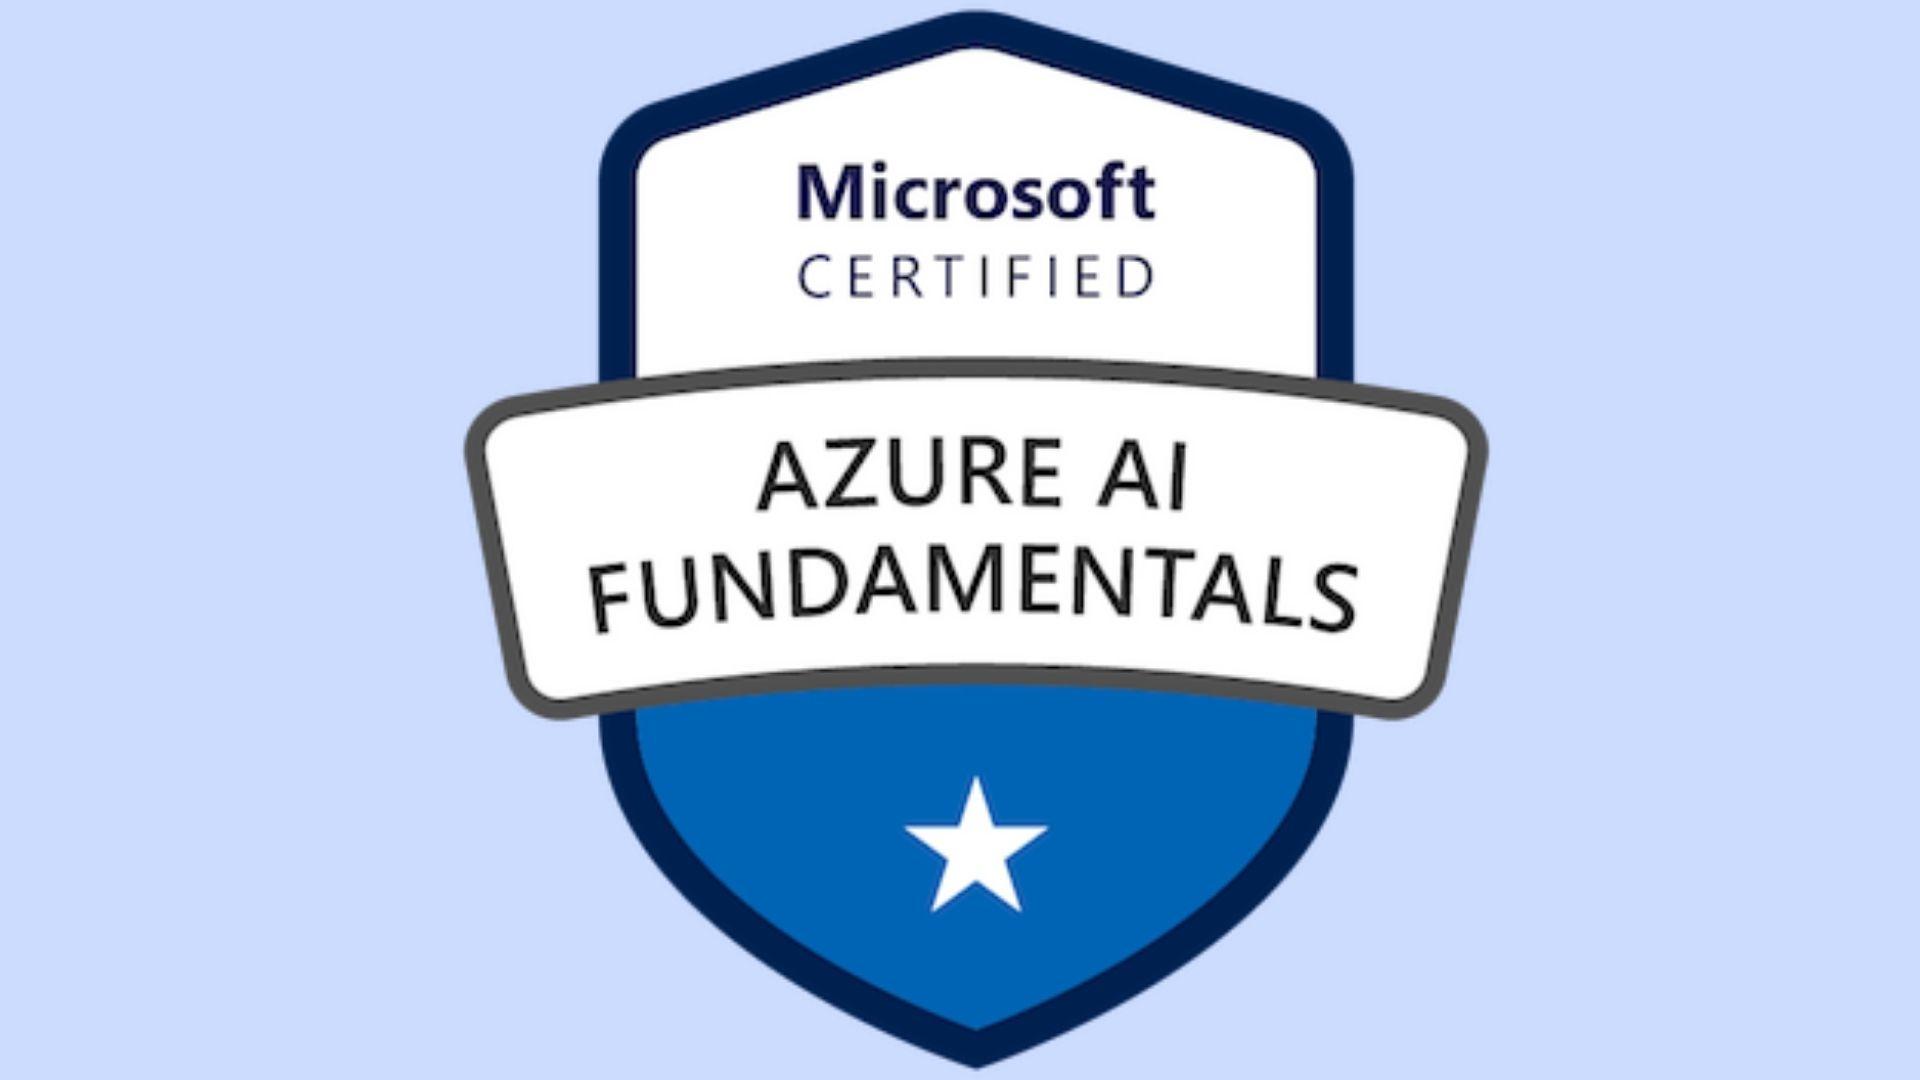 _Azure AI Fundamentals